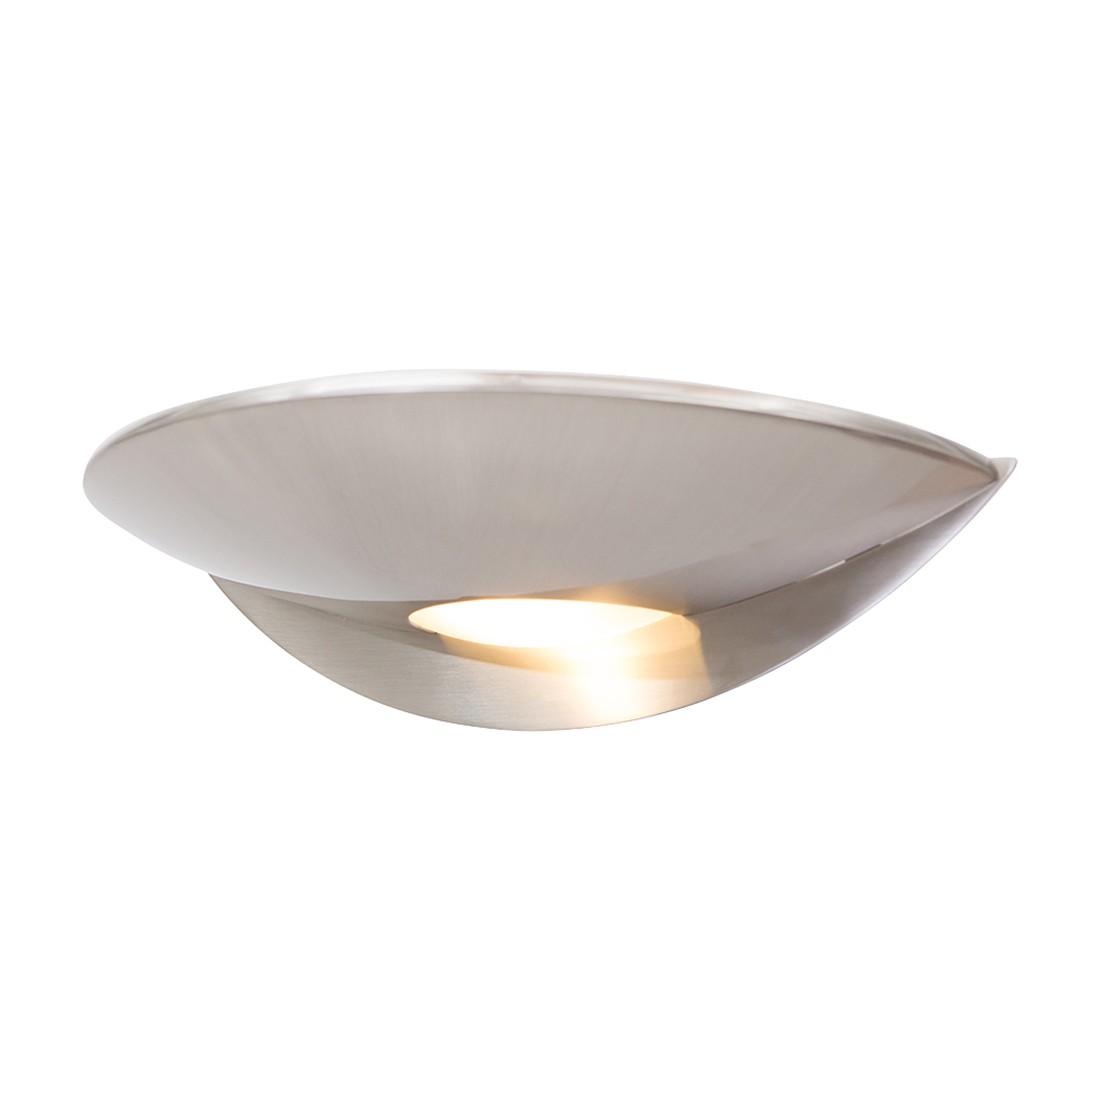 energie  A+, LED-wandlamp Tamara - 2 lichtbronnen mat nikkelkleurig, Steinhauer